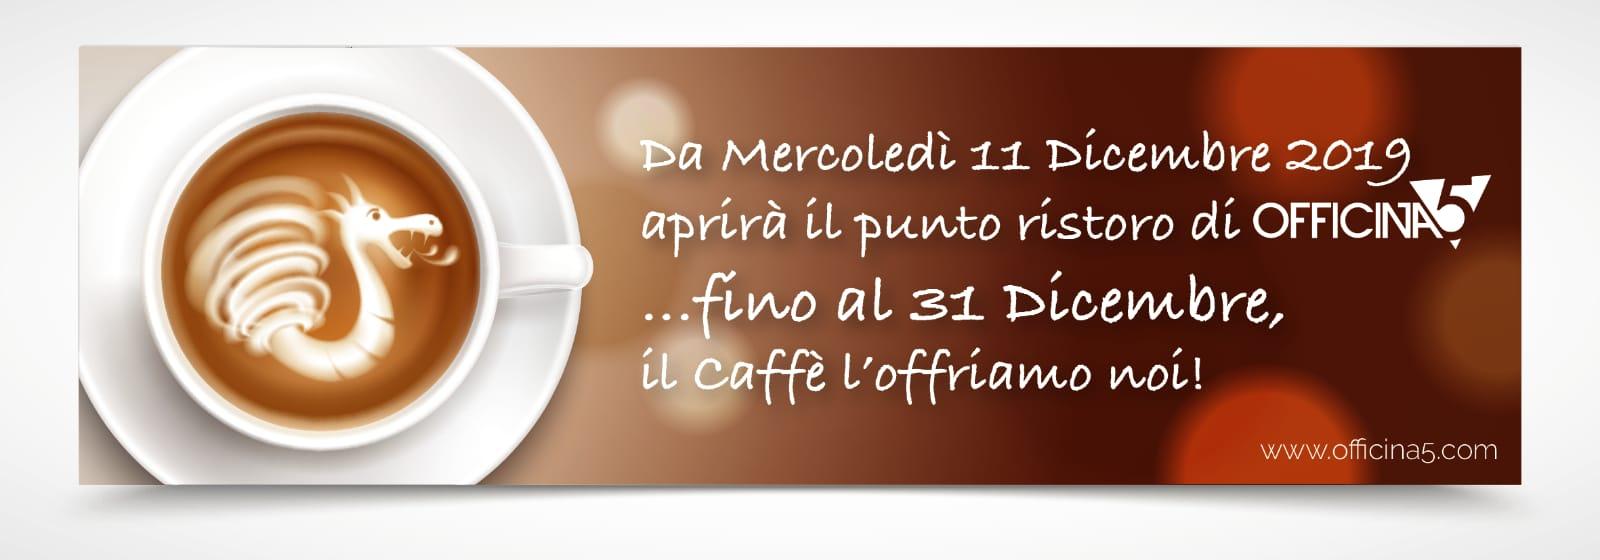 Nuova apertura BAR caffè gratis